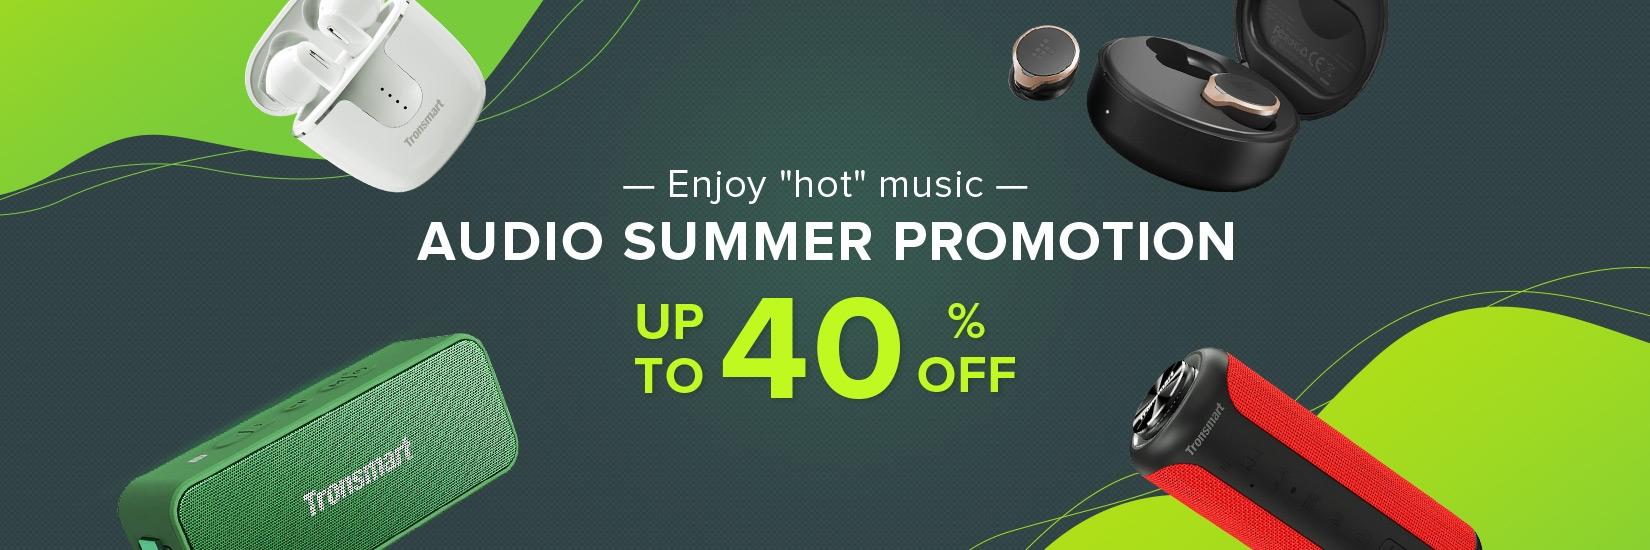 Summer Audio Promotion - Geekbuying.pl